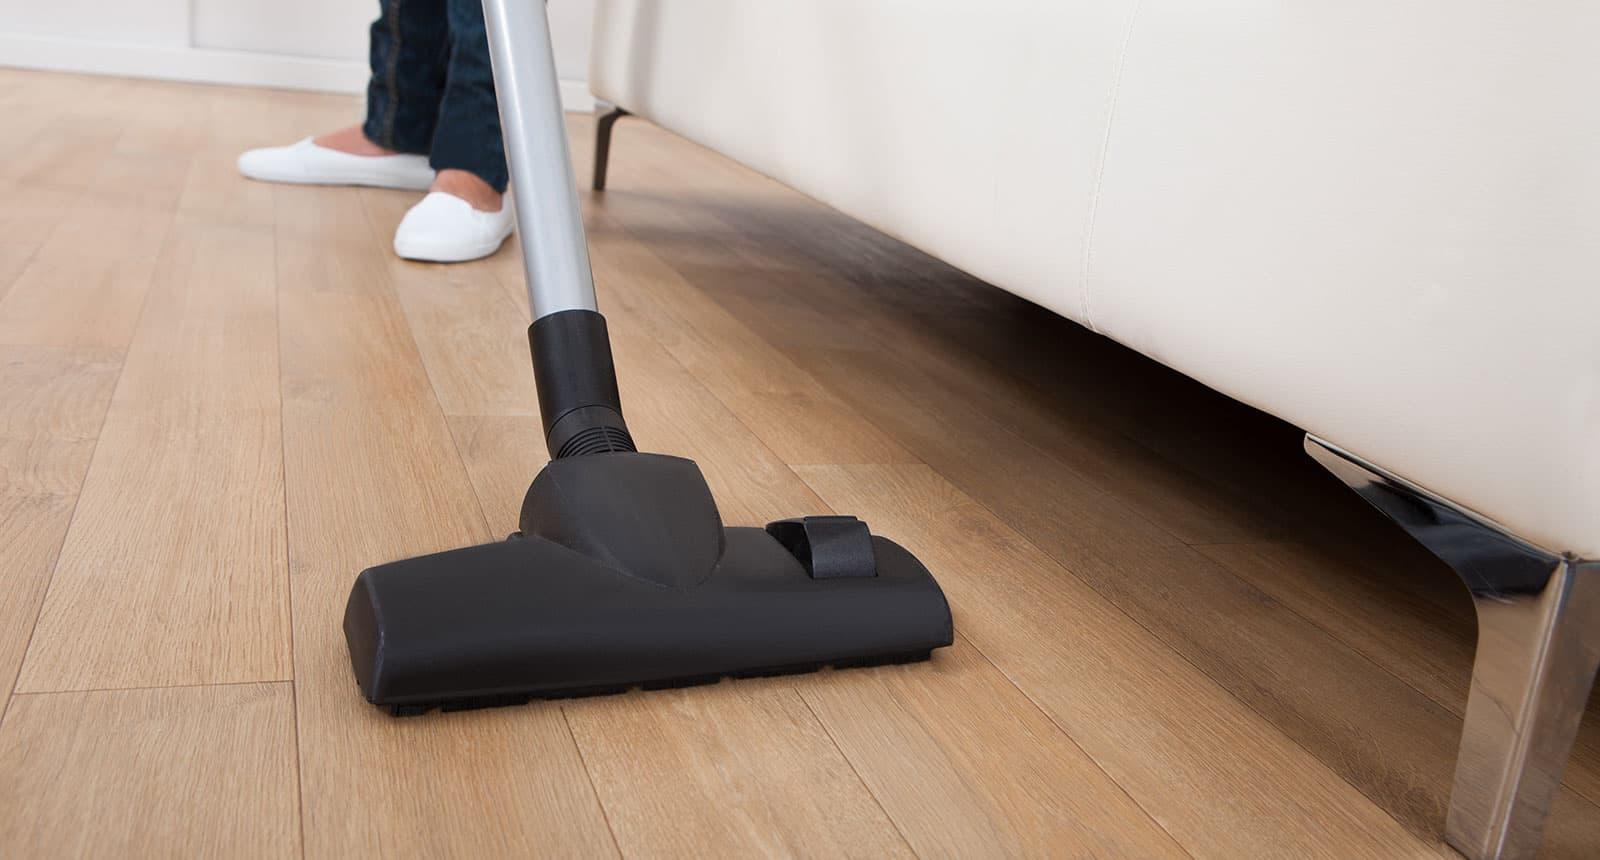 Vacuuming Floor